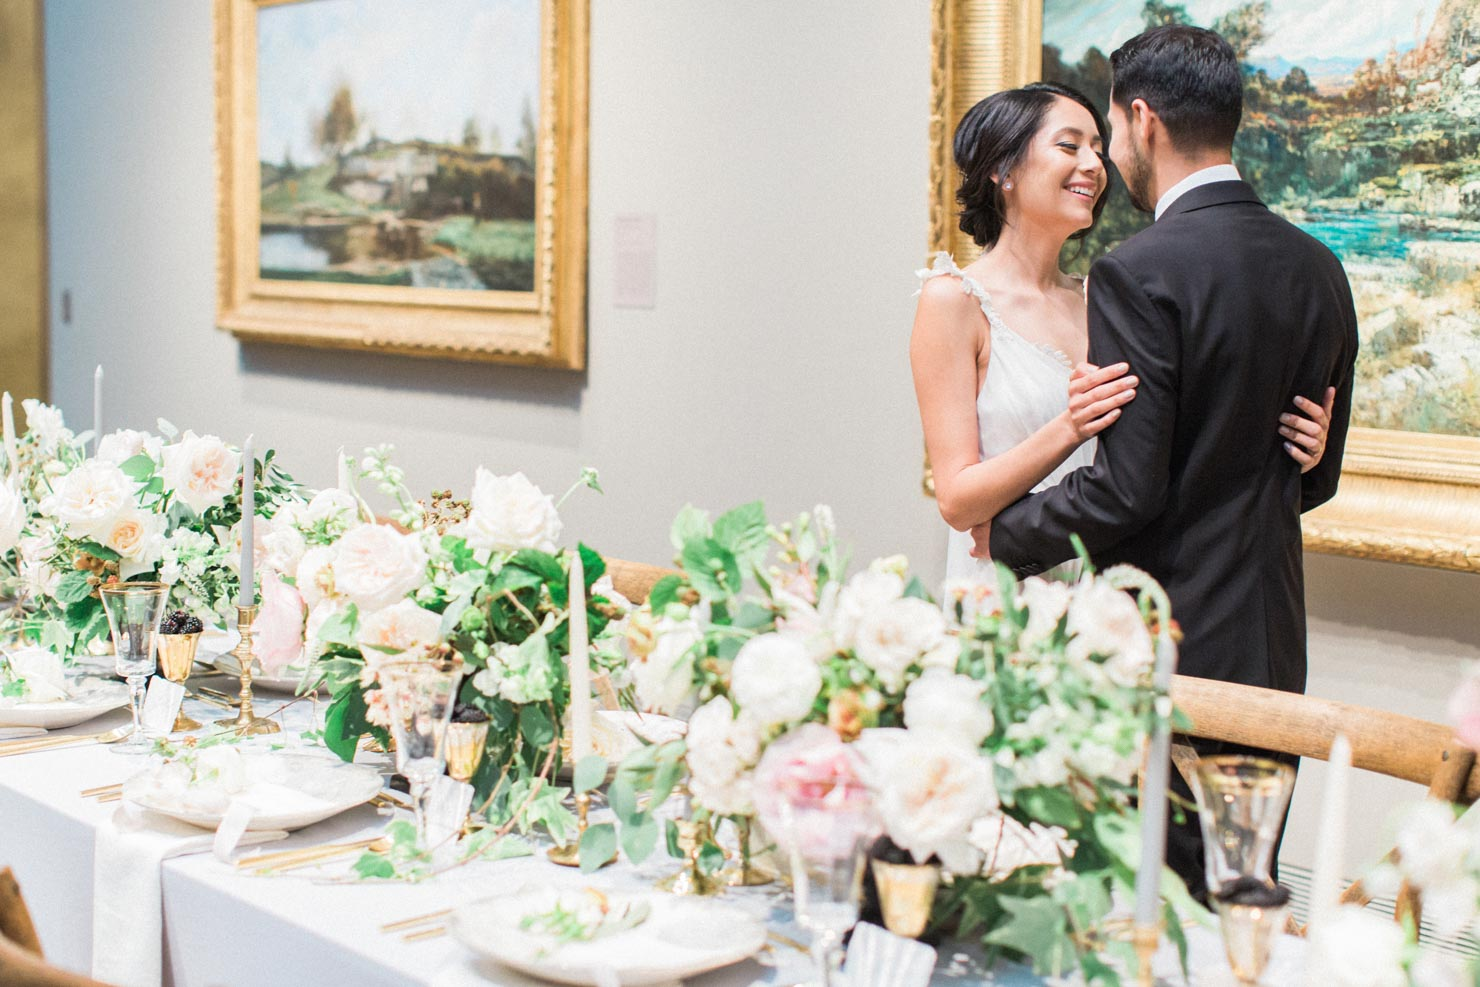 Lilly & Erick Beltran of Daily Craving celebrate 10 year wedding anniversary